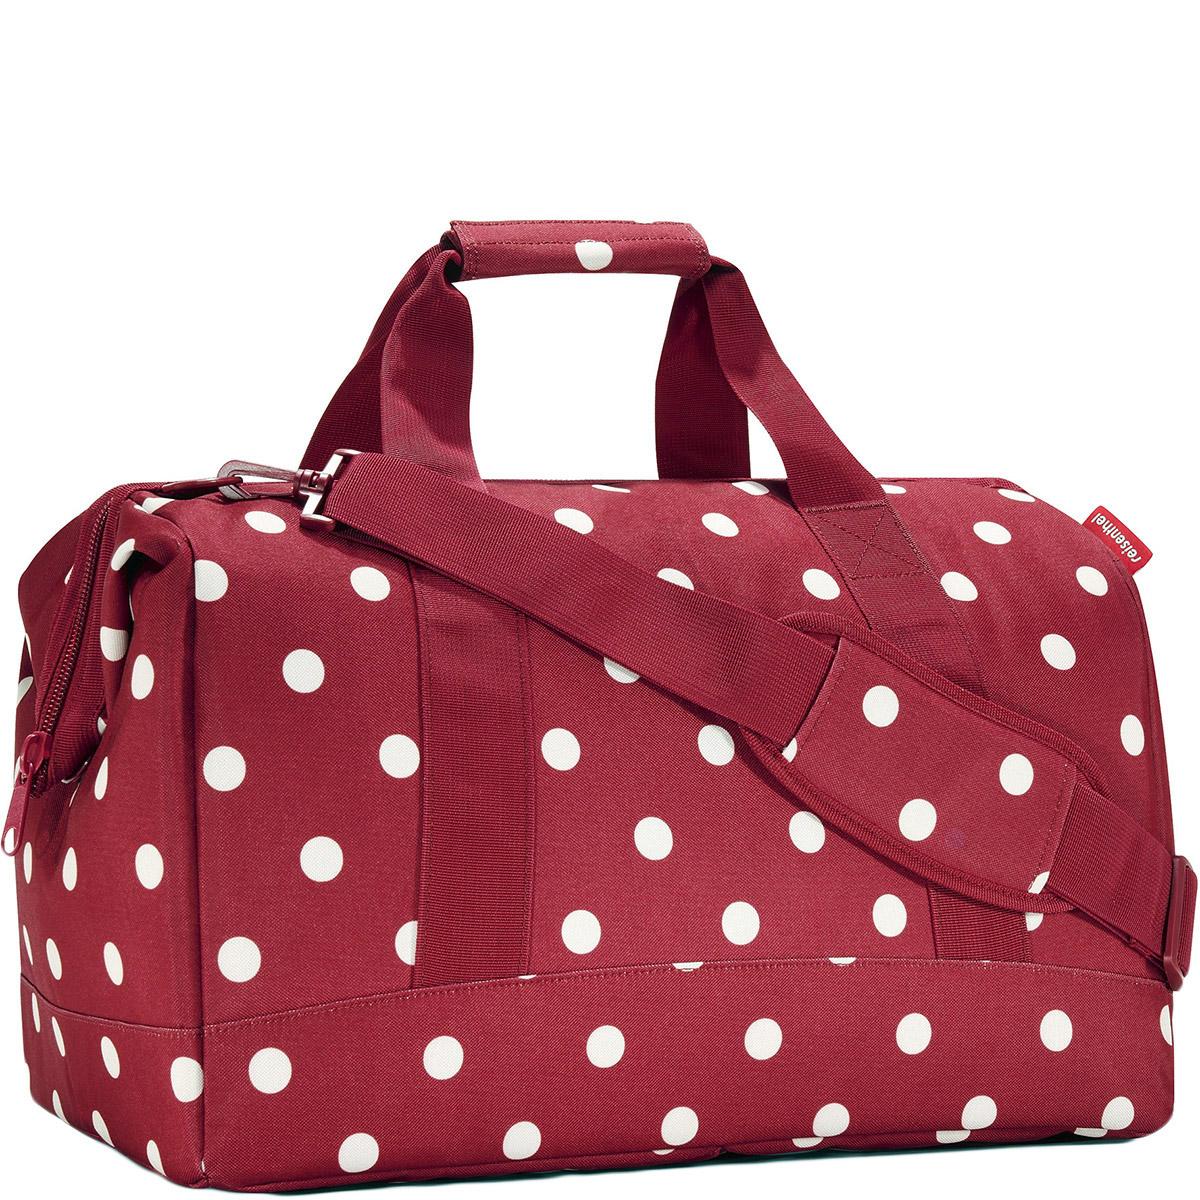 e5b1ff35f3748 Torba podróżna Reisenthel Allrounder L Ruby Dots | sklep internetowy ...